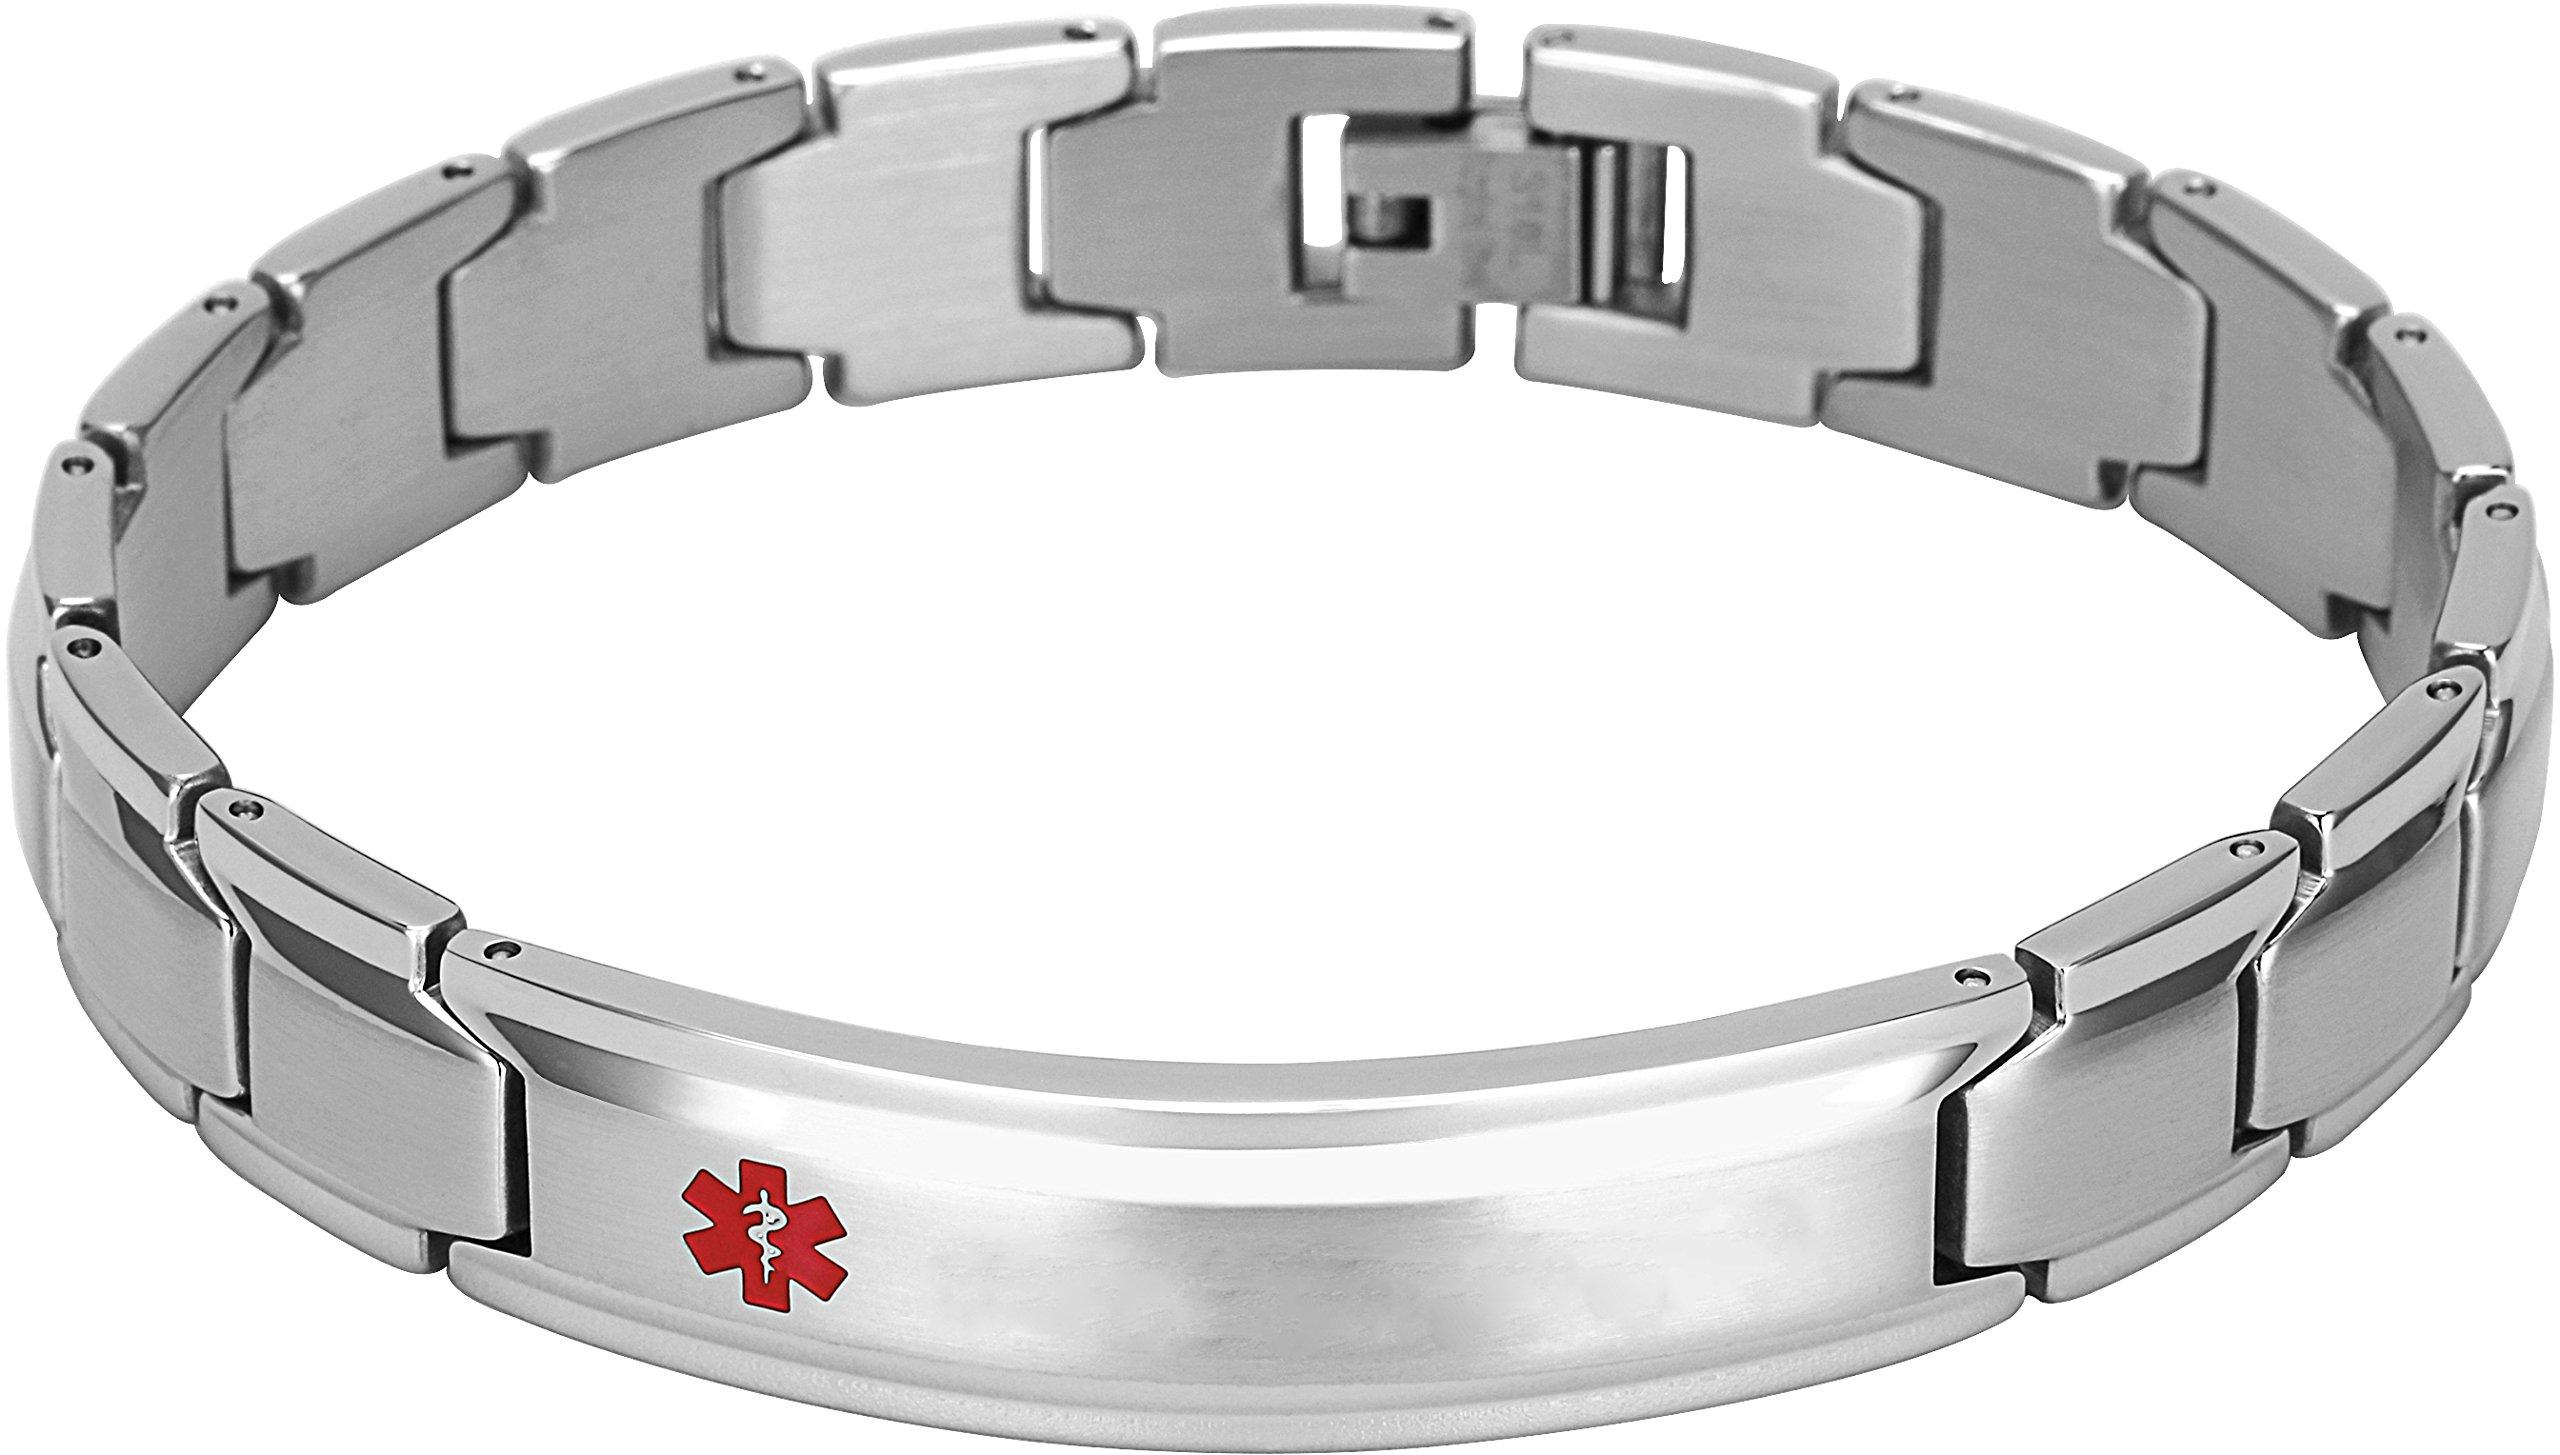 Elegant Surgical Grade Steel Medical Alert ID Bracelet for Men and Women (Men's, Blank/Empty} No Message) by Smarter LifeStyle